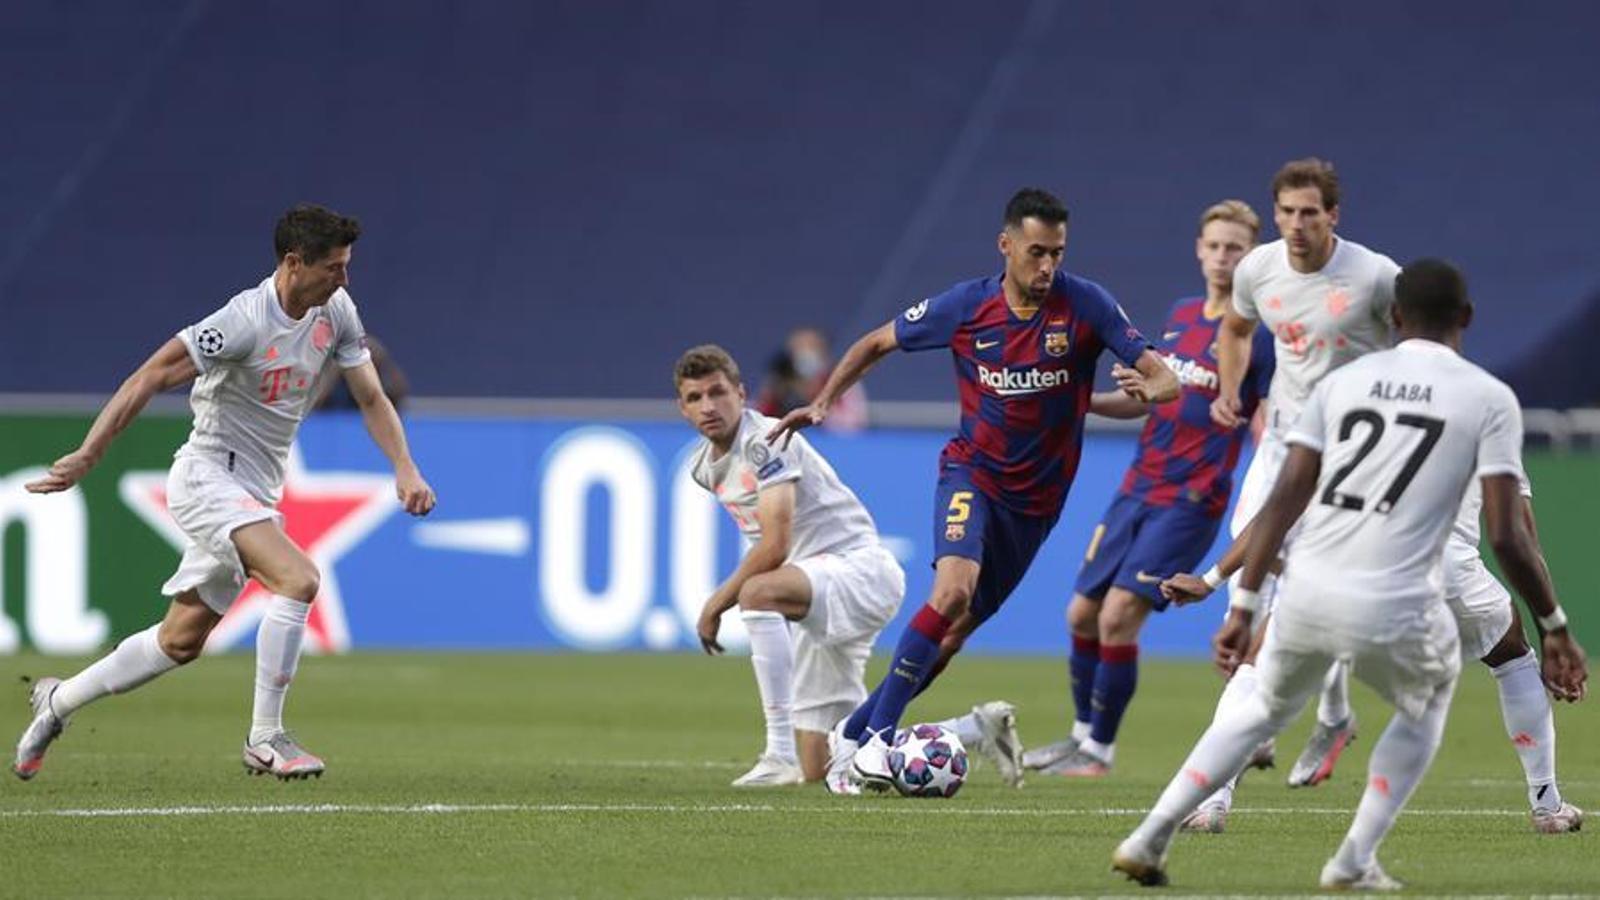 Busquets intenta controlar una pilota contra el Bayern